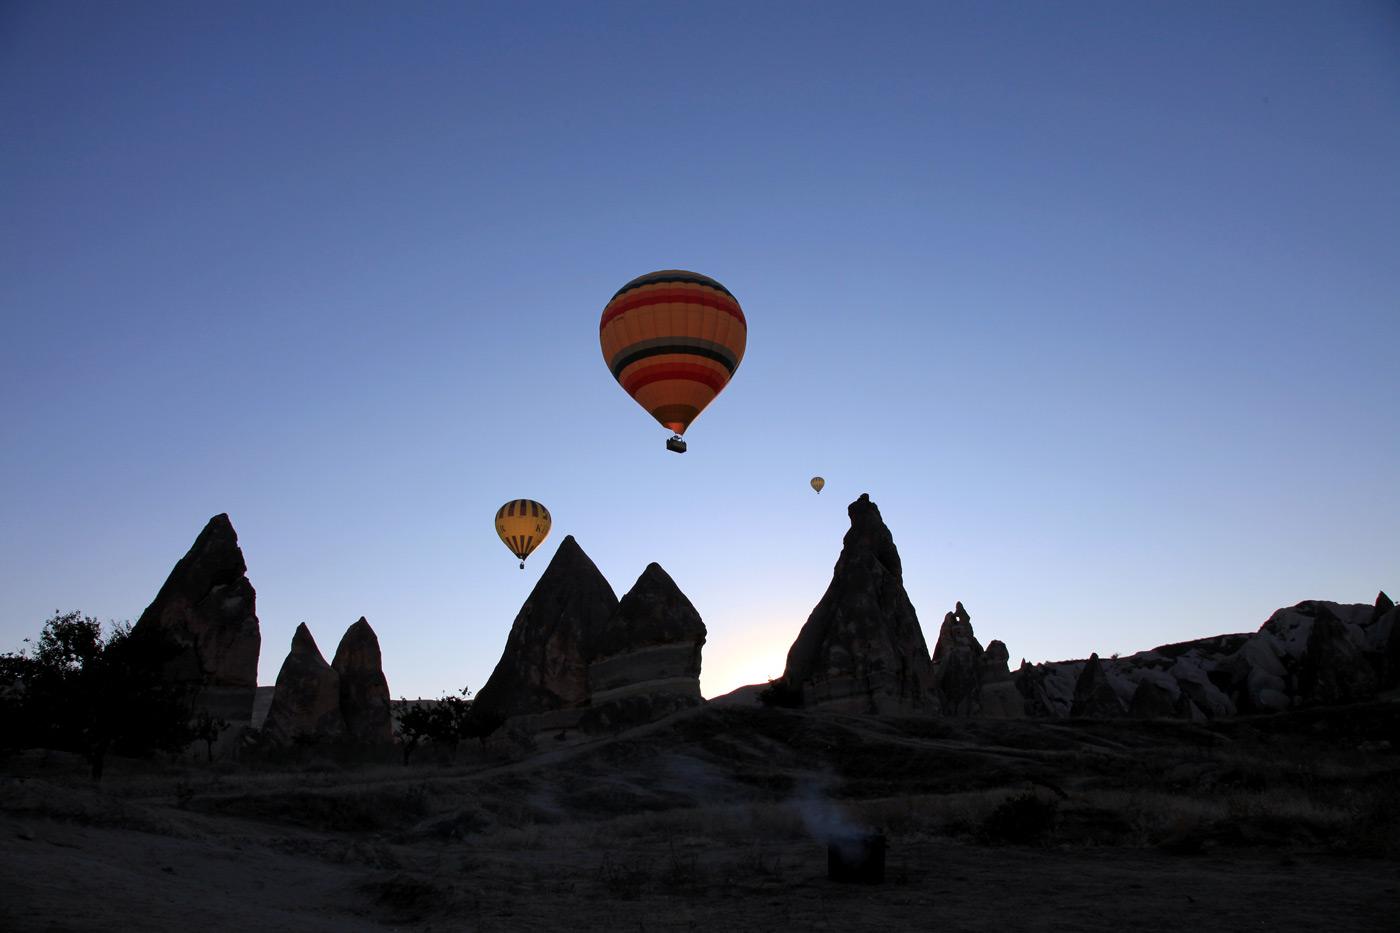 Balloons over Rose Valley, Cappadocia, Turkey